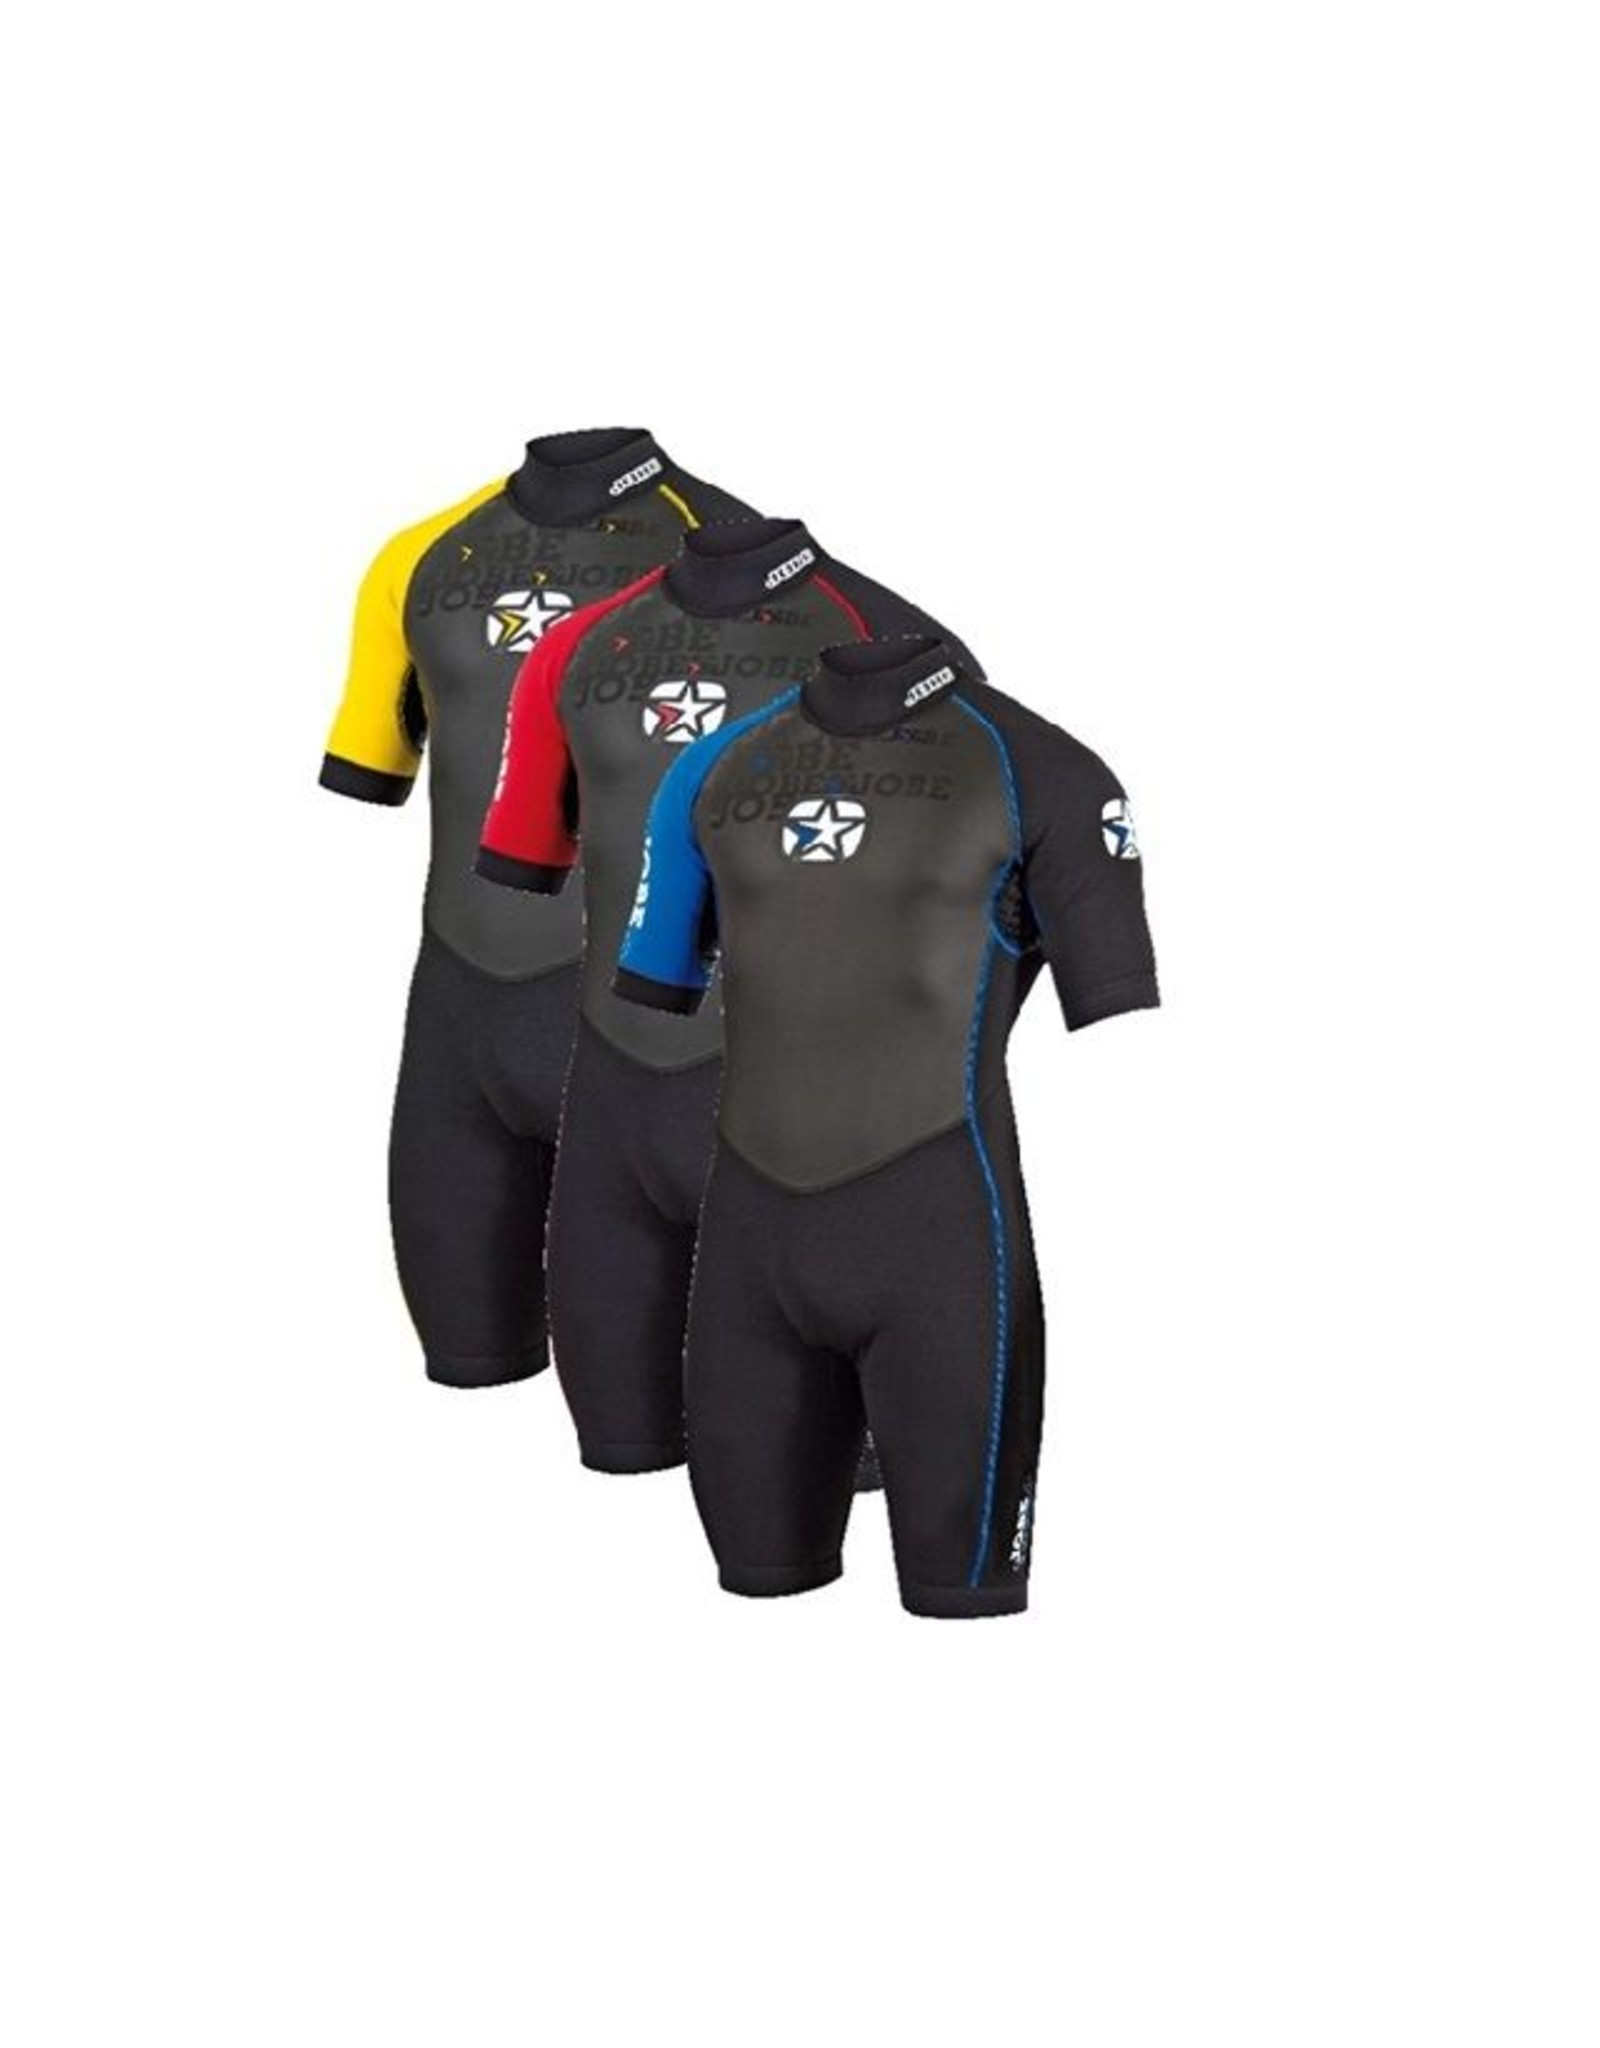 Hebor Watersport Jobe Shorty Extra wetsuit - 4